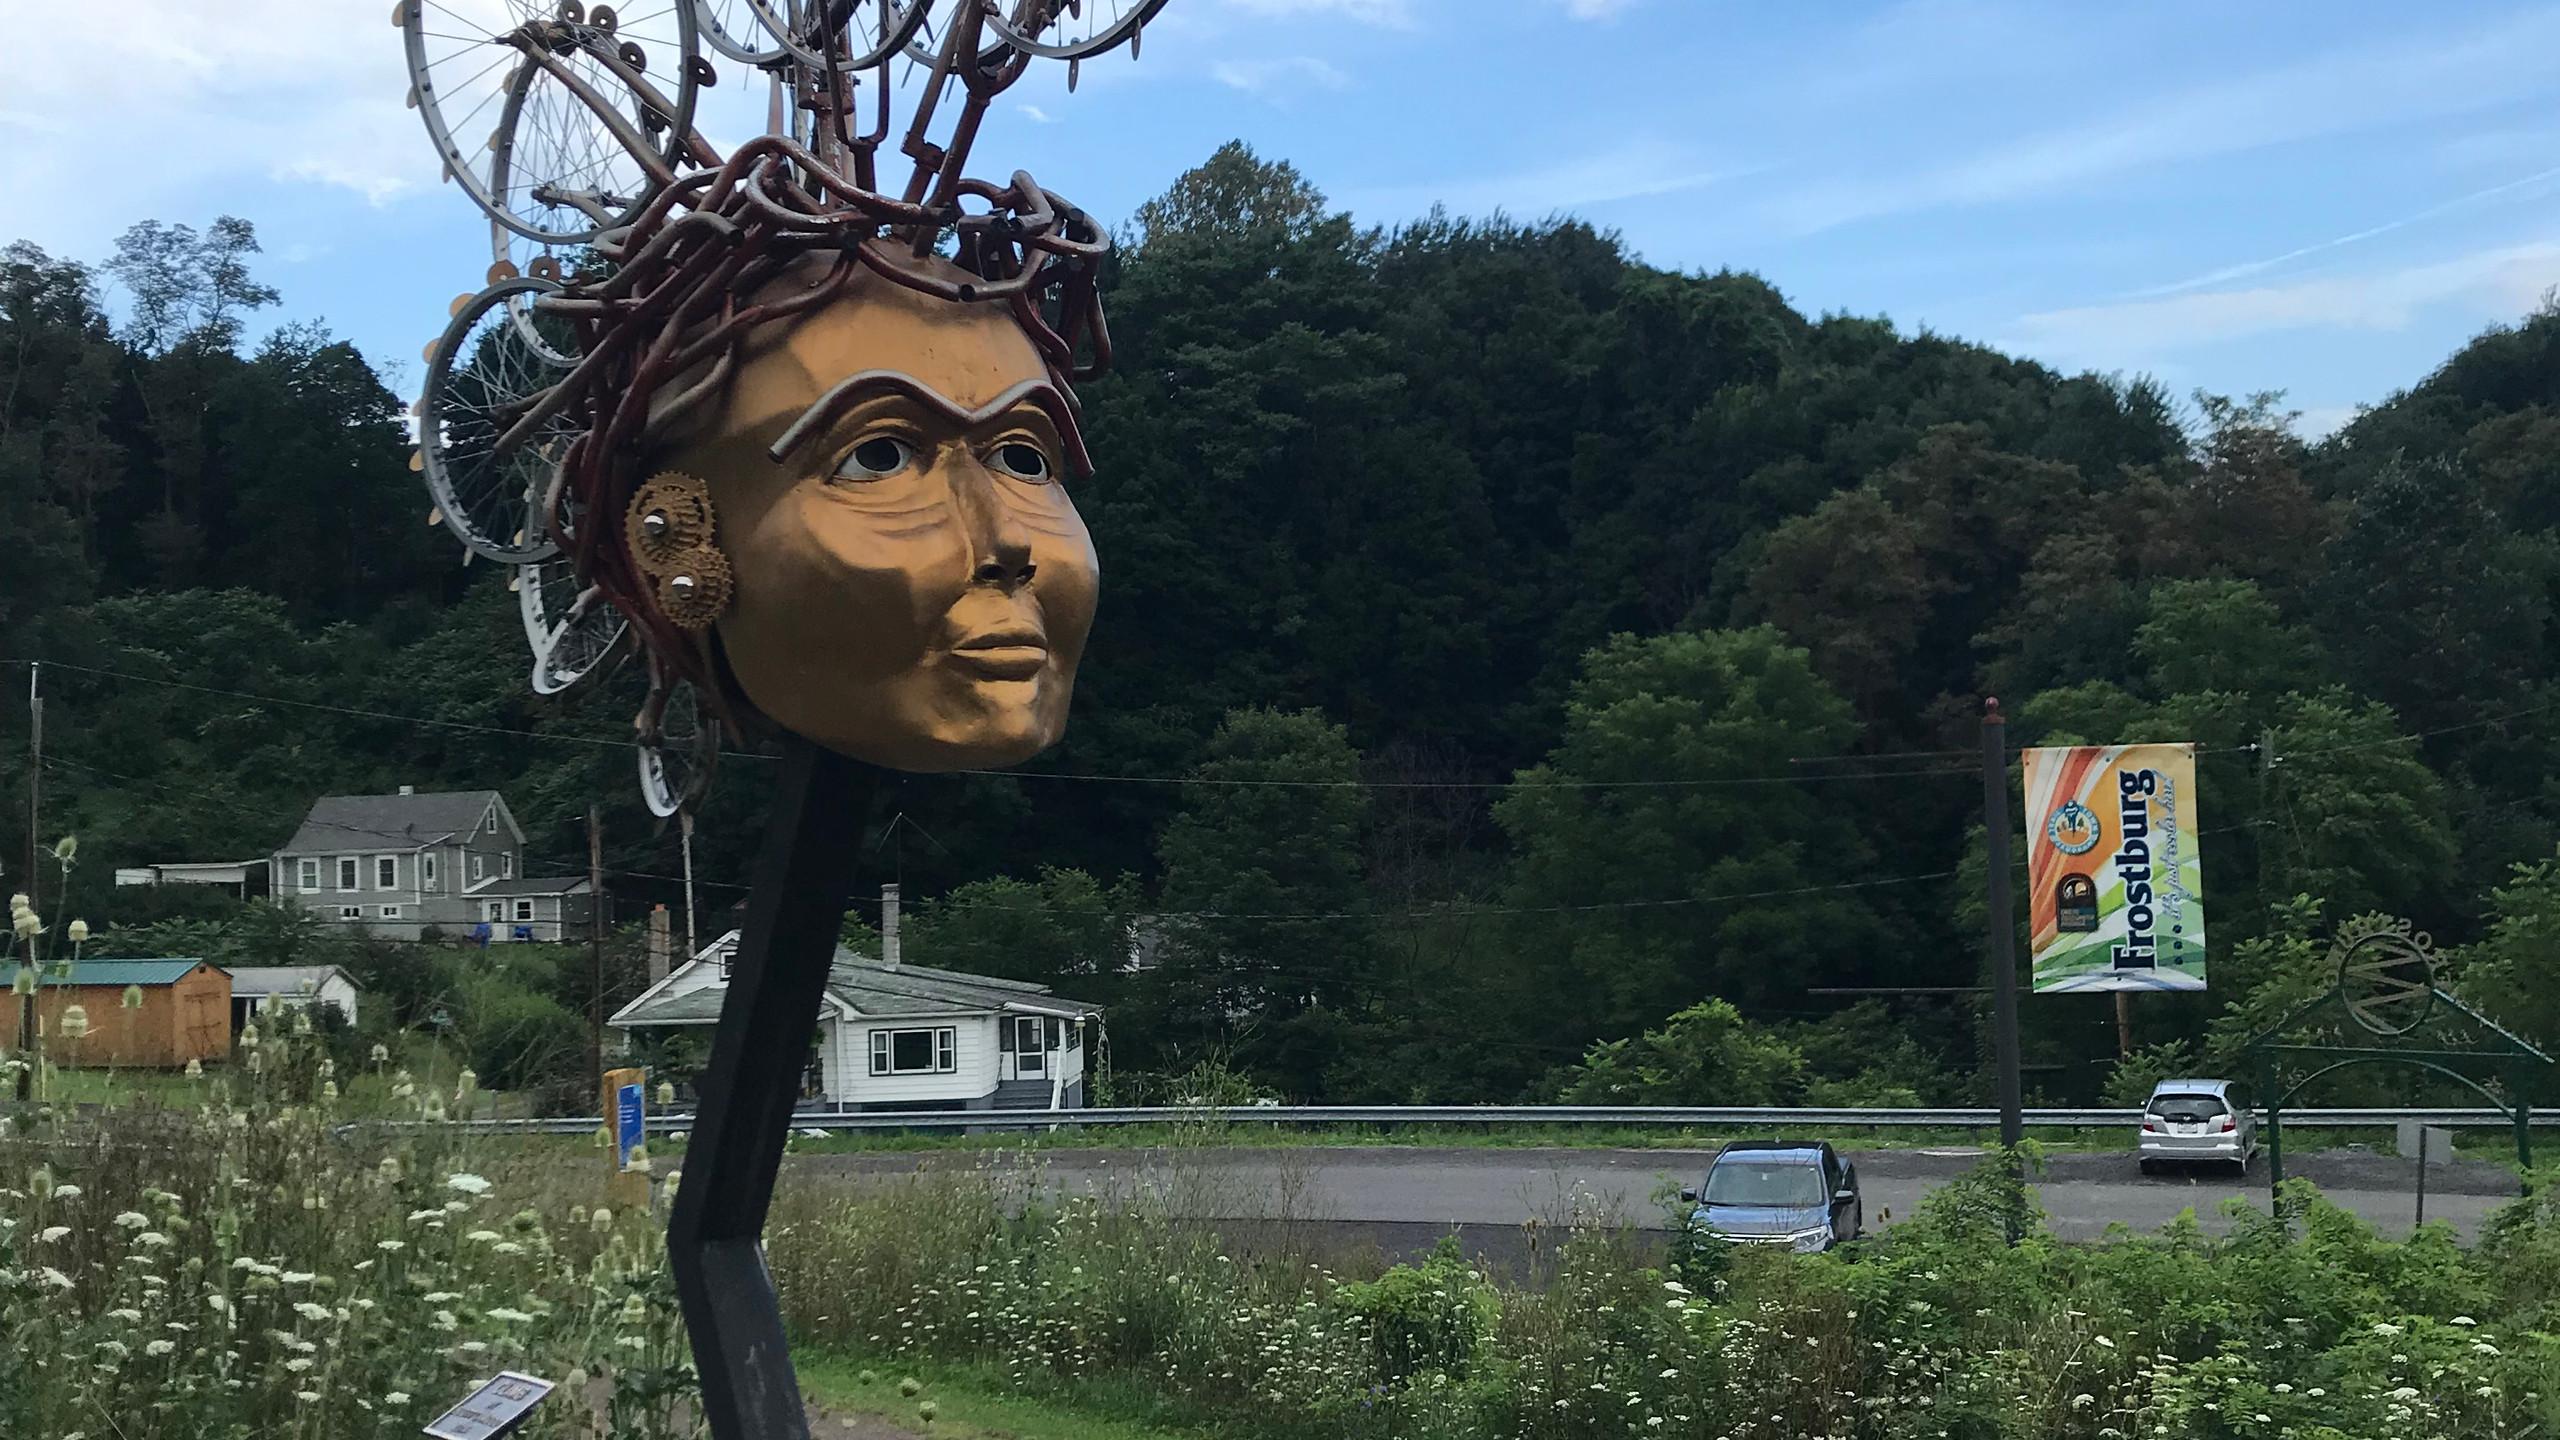 Sculpture on the Frostburg Trail